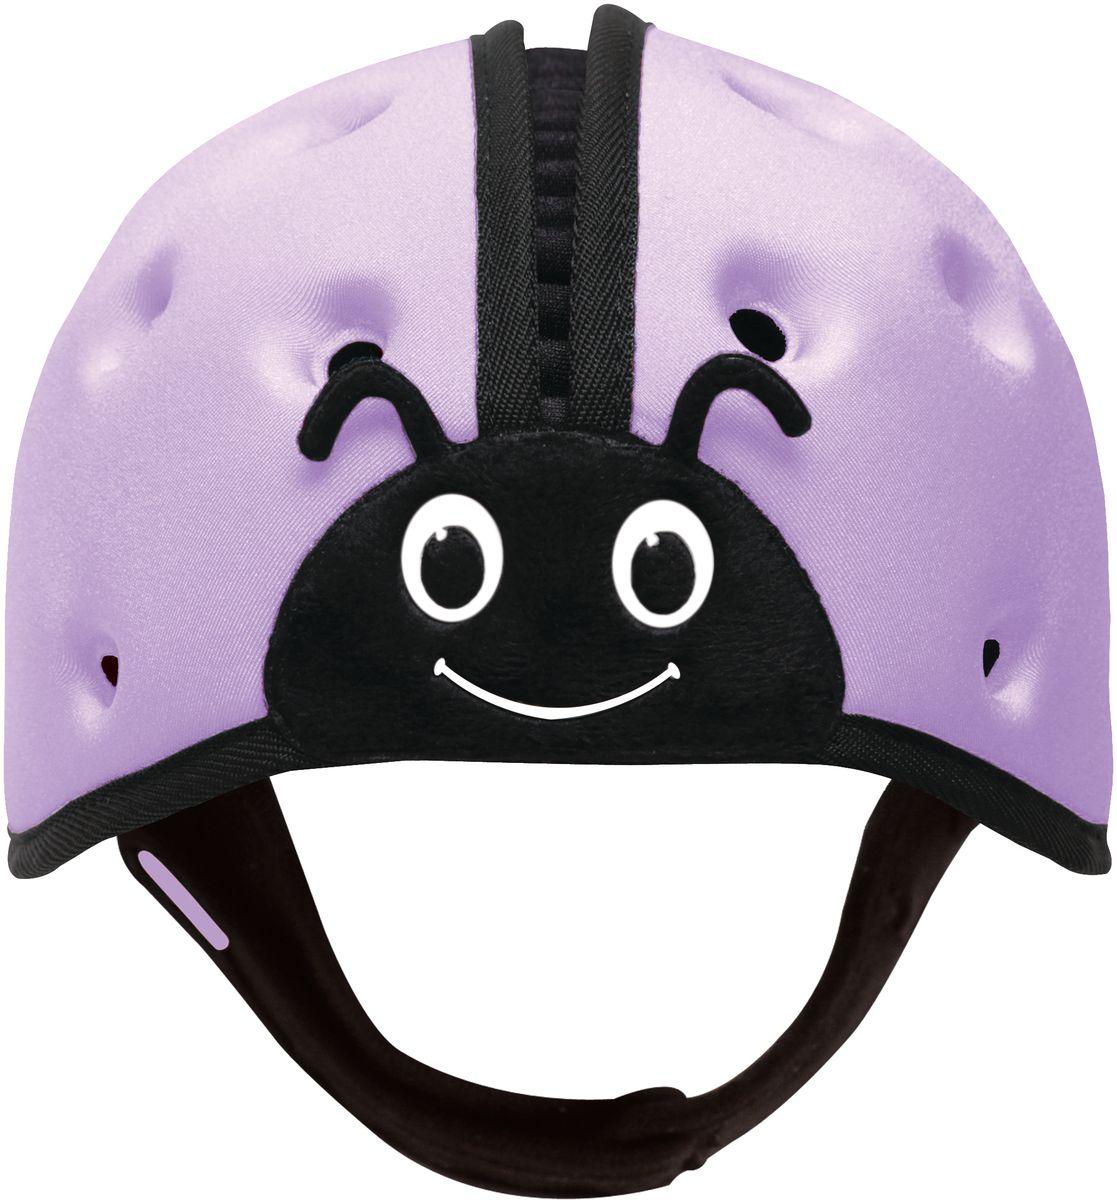 SafeheadBABY Шапка-шлем Божья коровка цвет фиолетовый